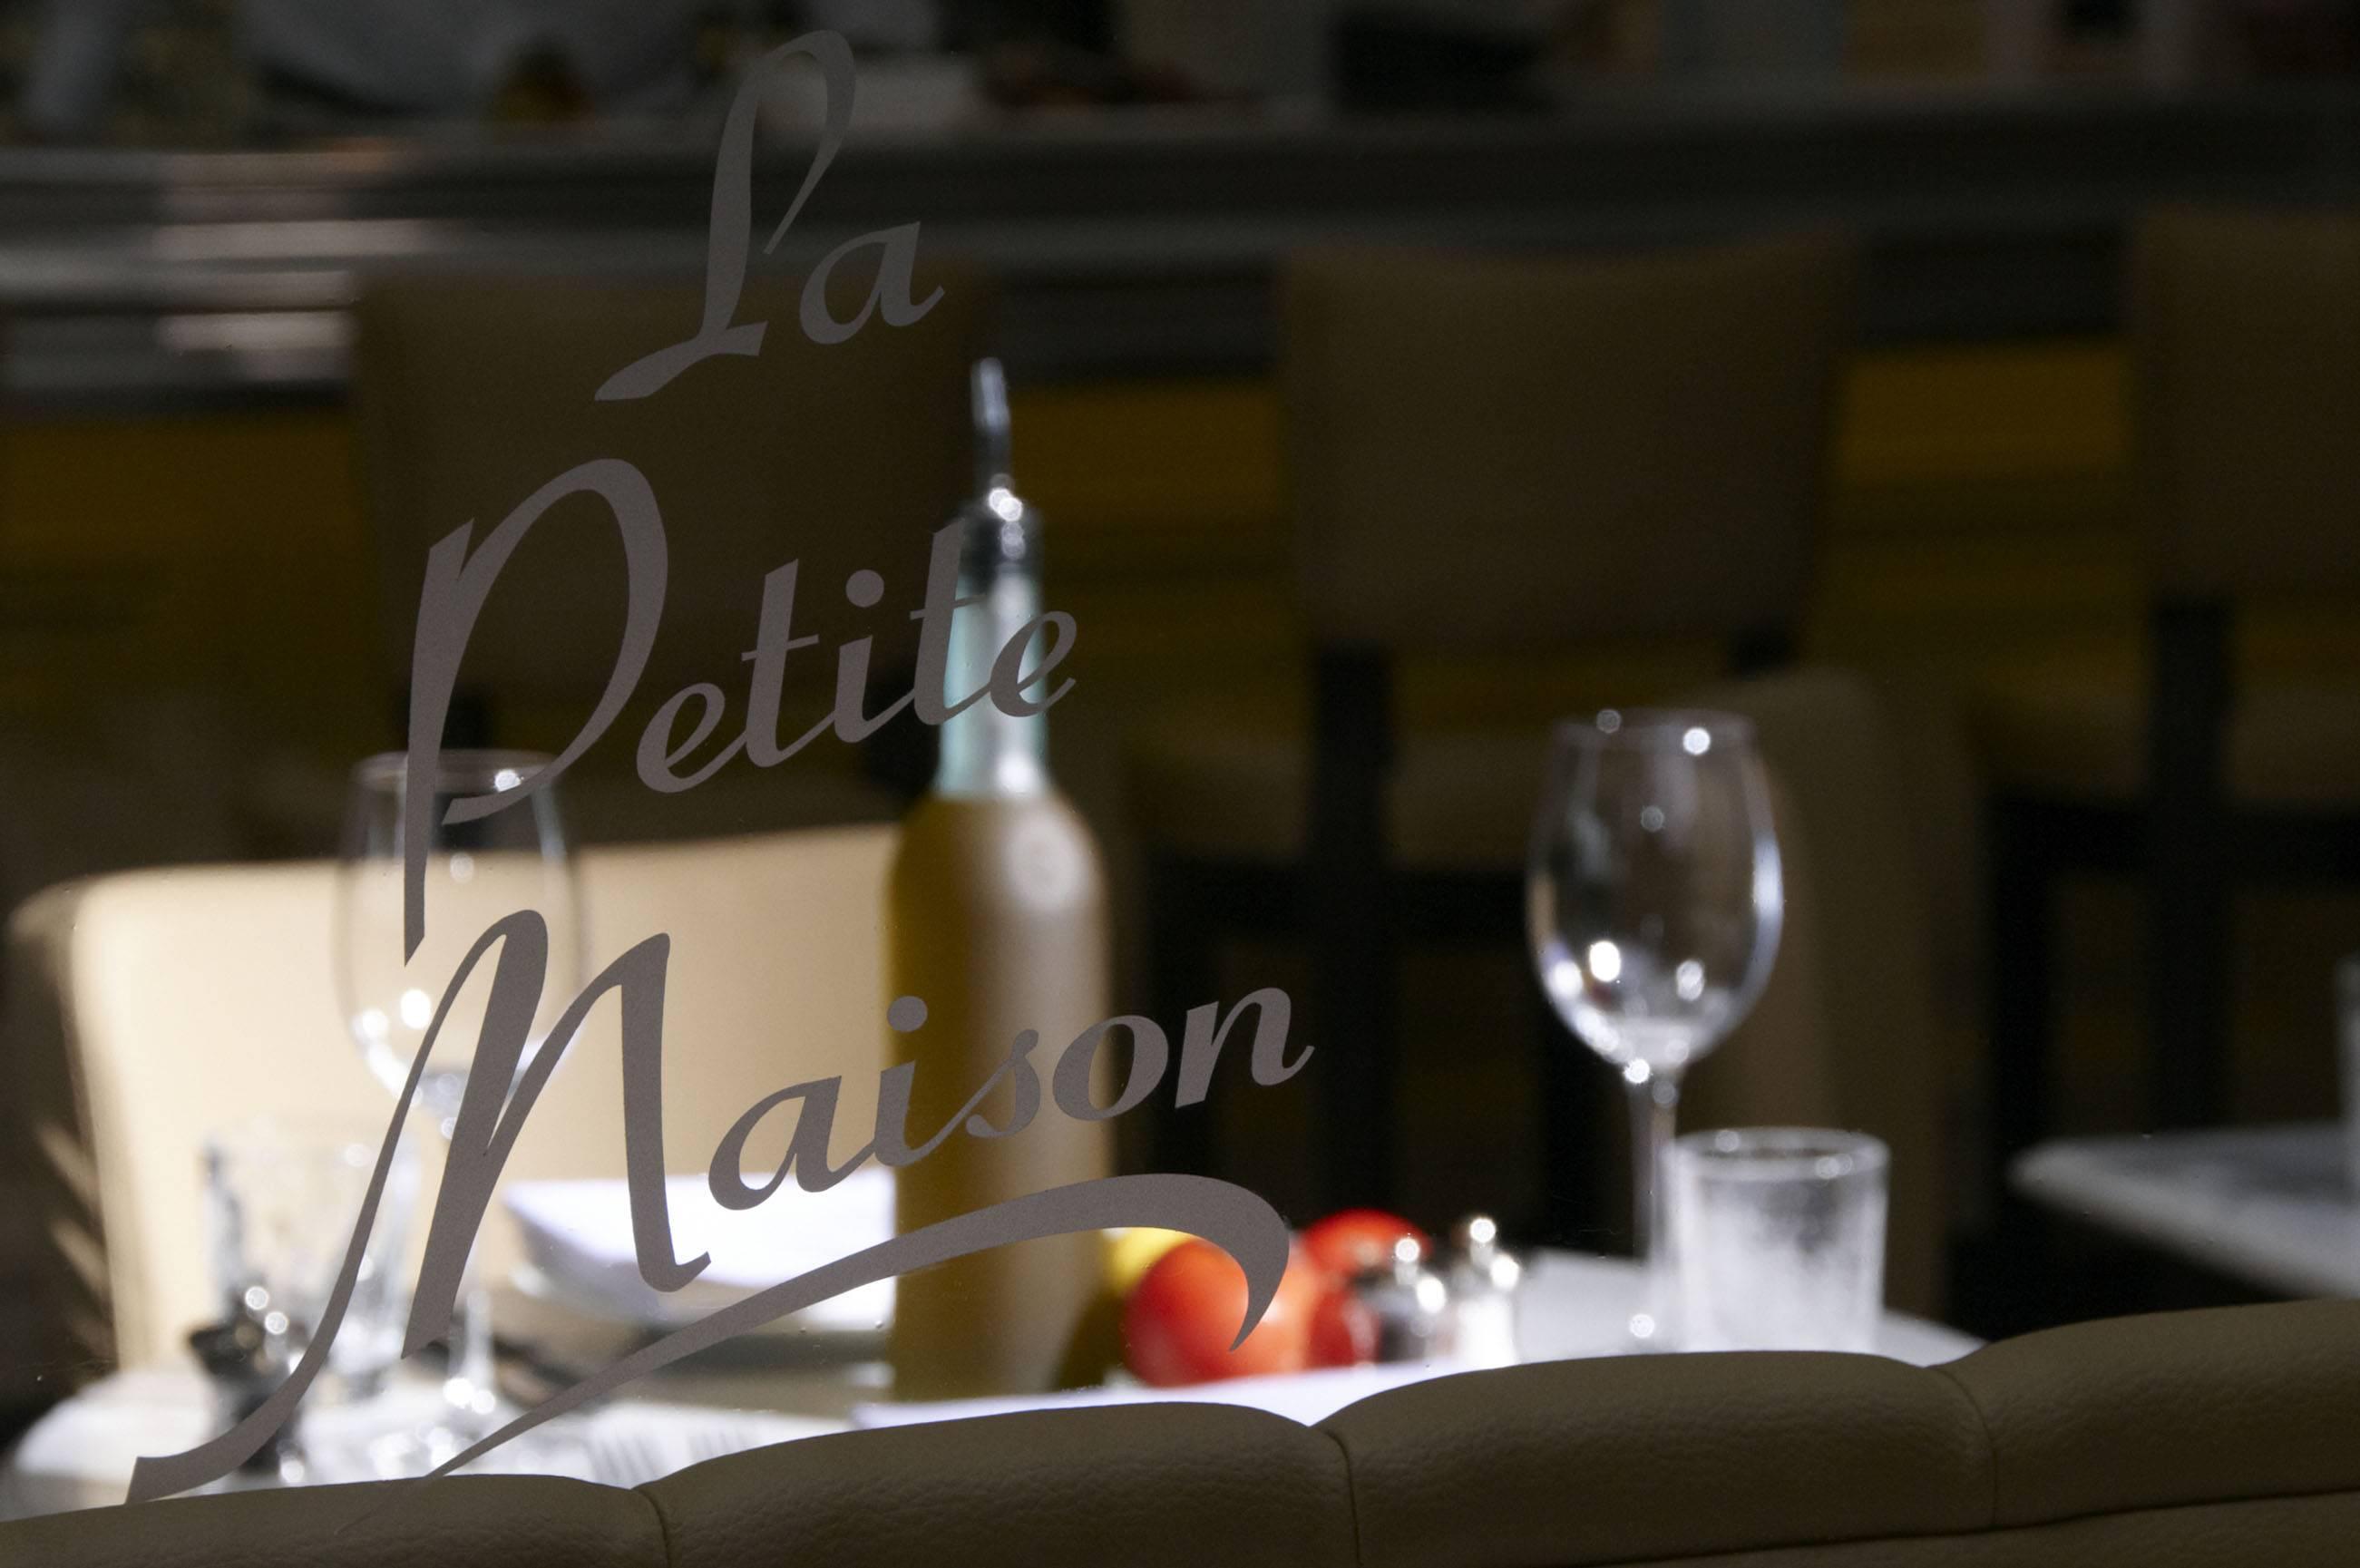 La Petite Maison Atlanta la petite maison hosts great gatsby-themed bash for new